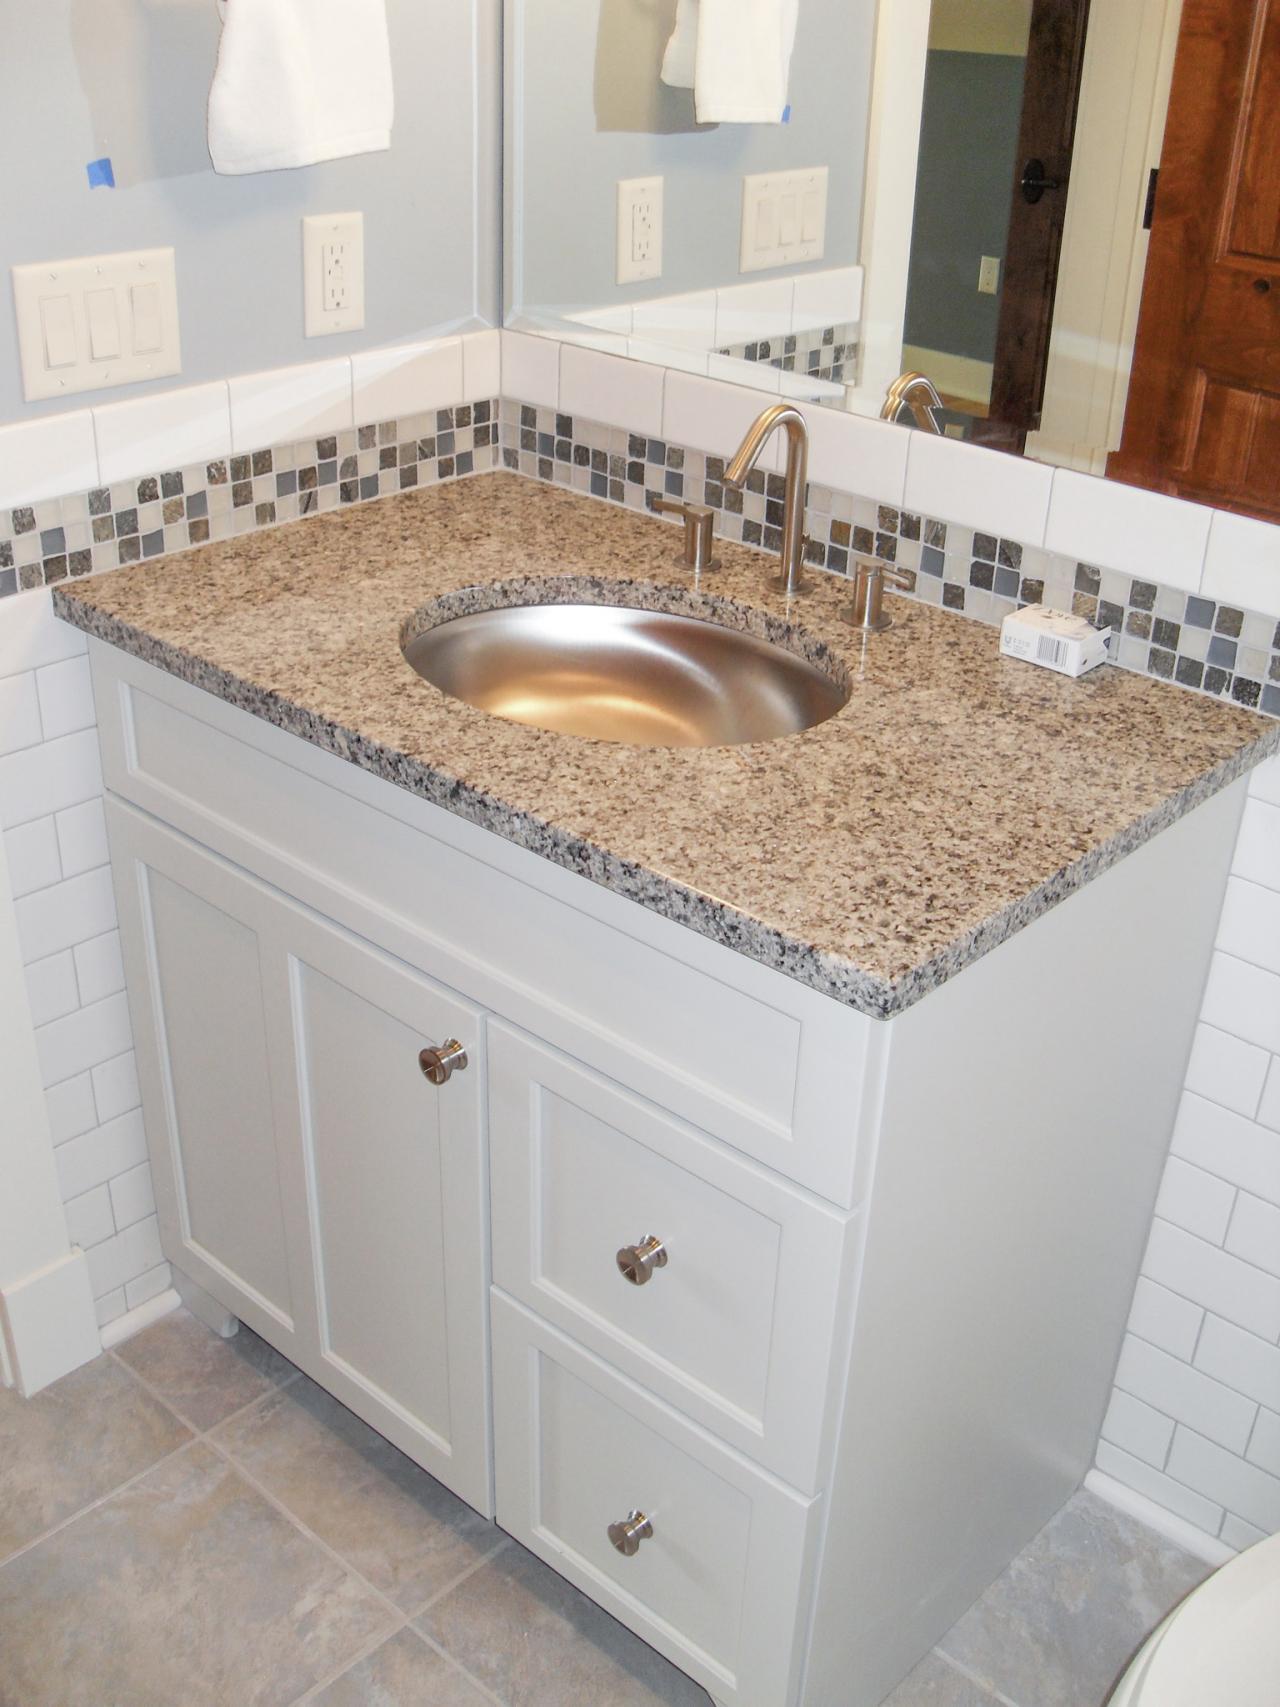 24 nice ideas of glass tiles for bathroom for Glass tiles for bathroom ideas